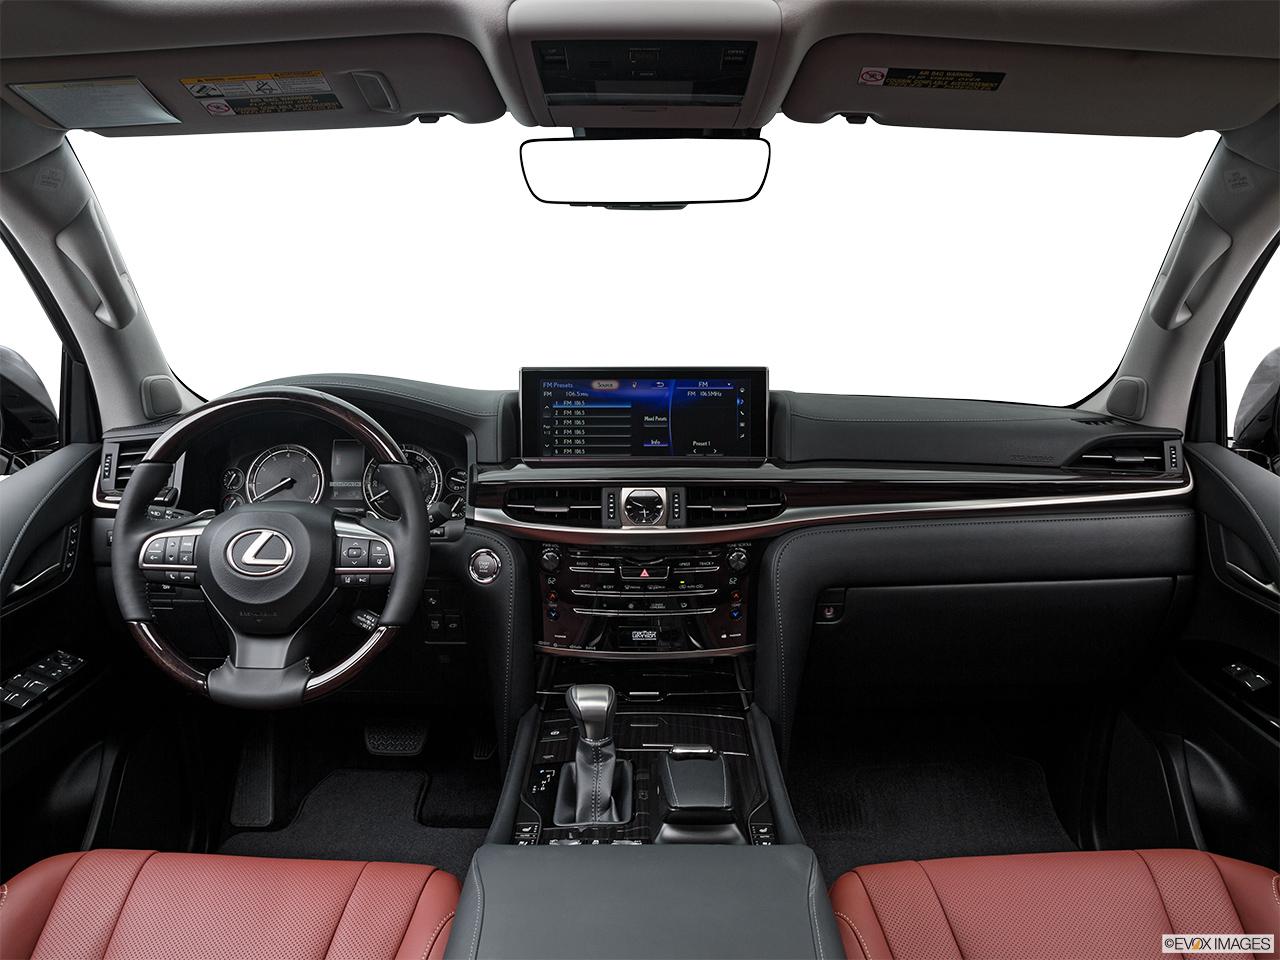 Lexus lx 2017 570 premier united arab emirates centered wide dash shot